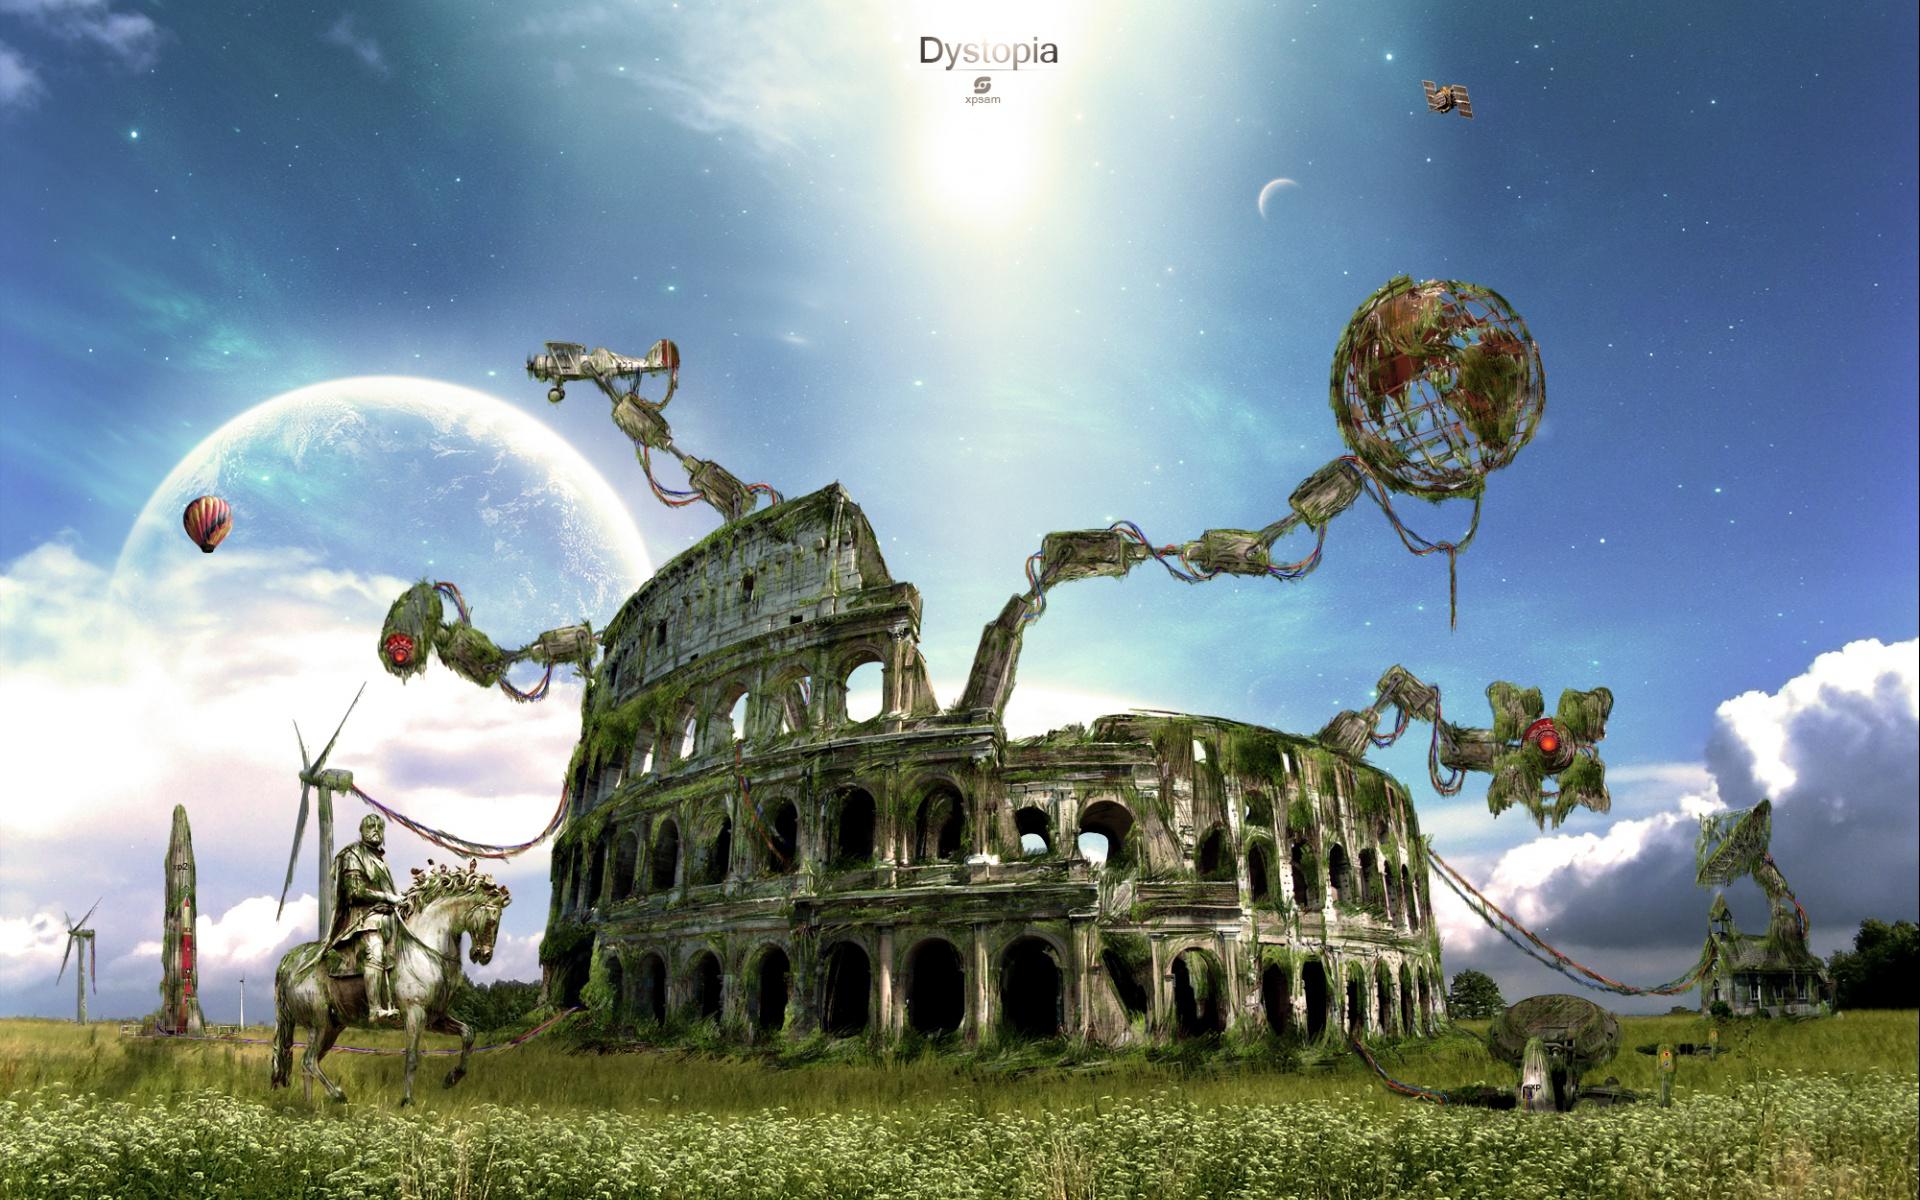 Colosseum Wallpaper Hd 3d Animation Wallpaper For Windows